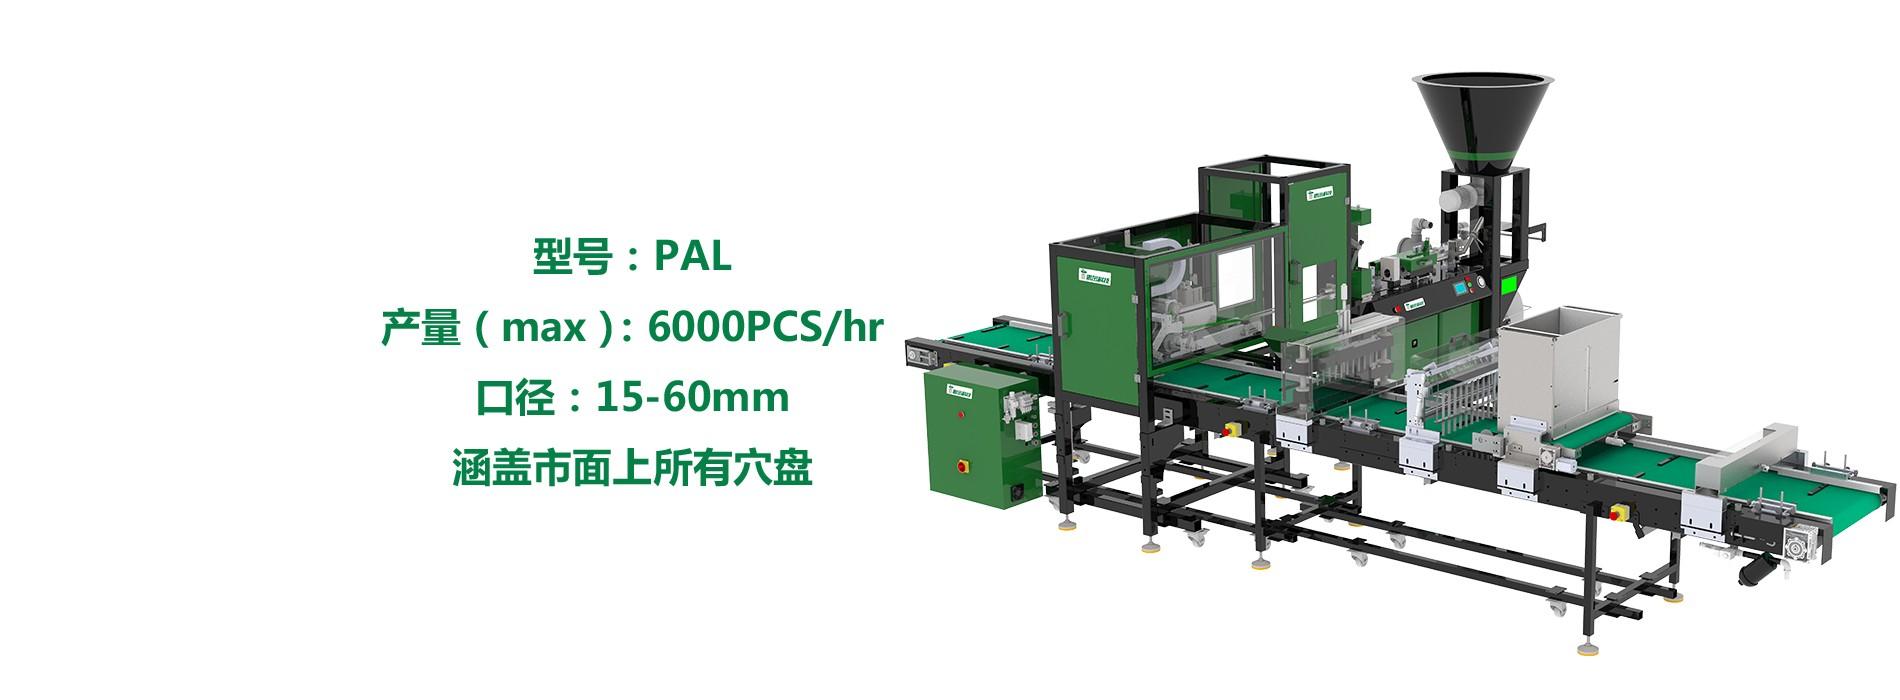 PAL(网站)-20200407